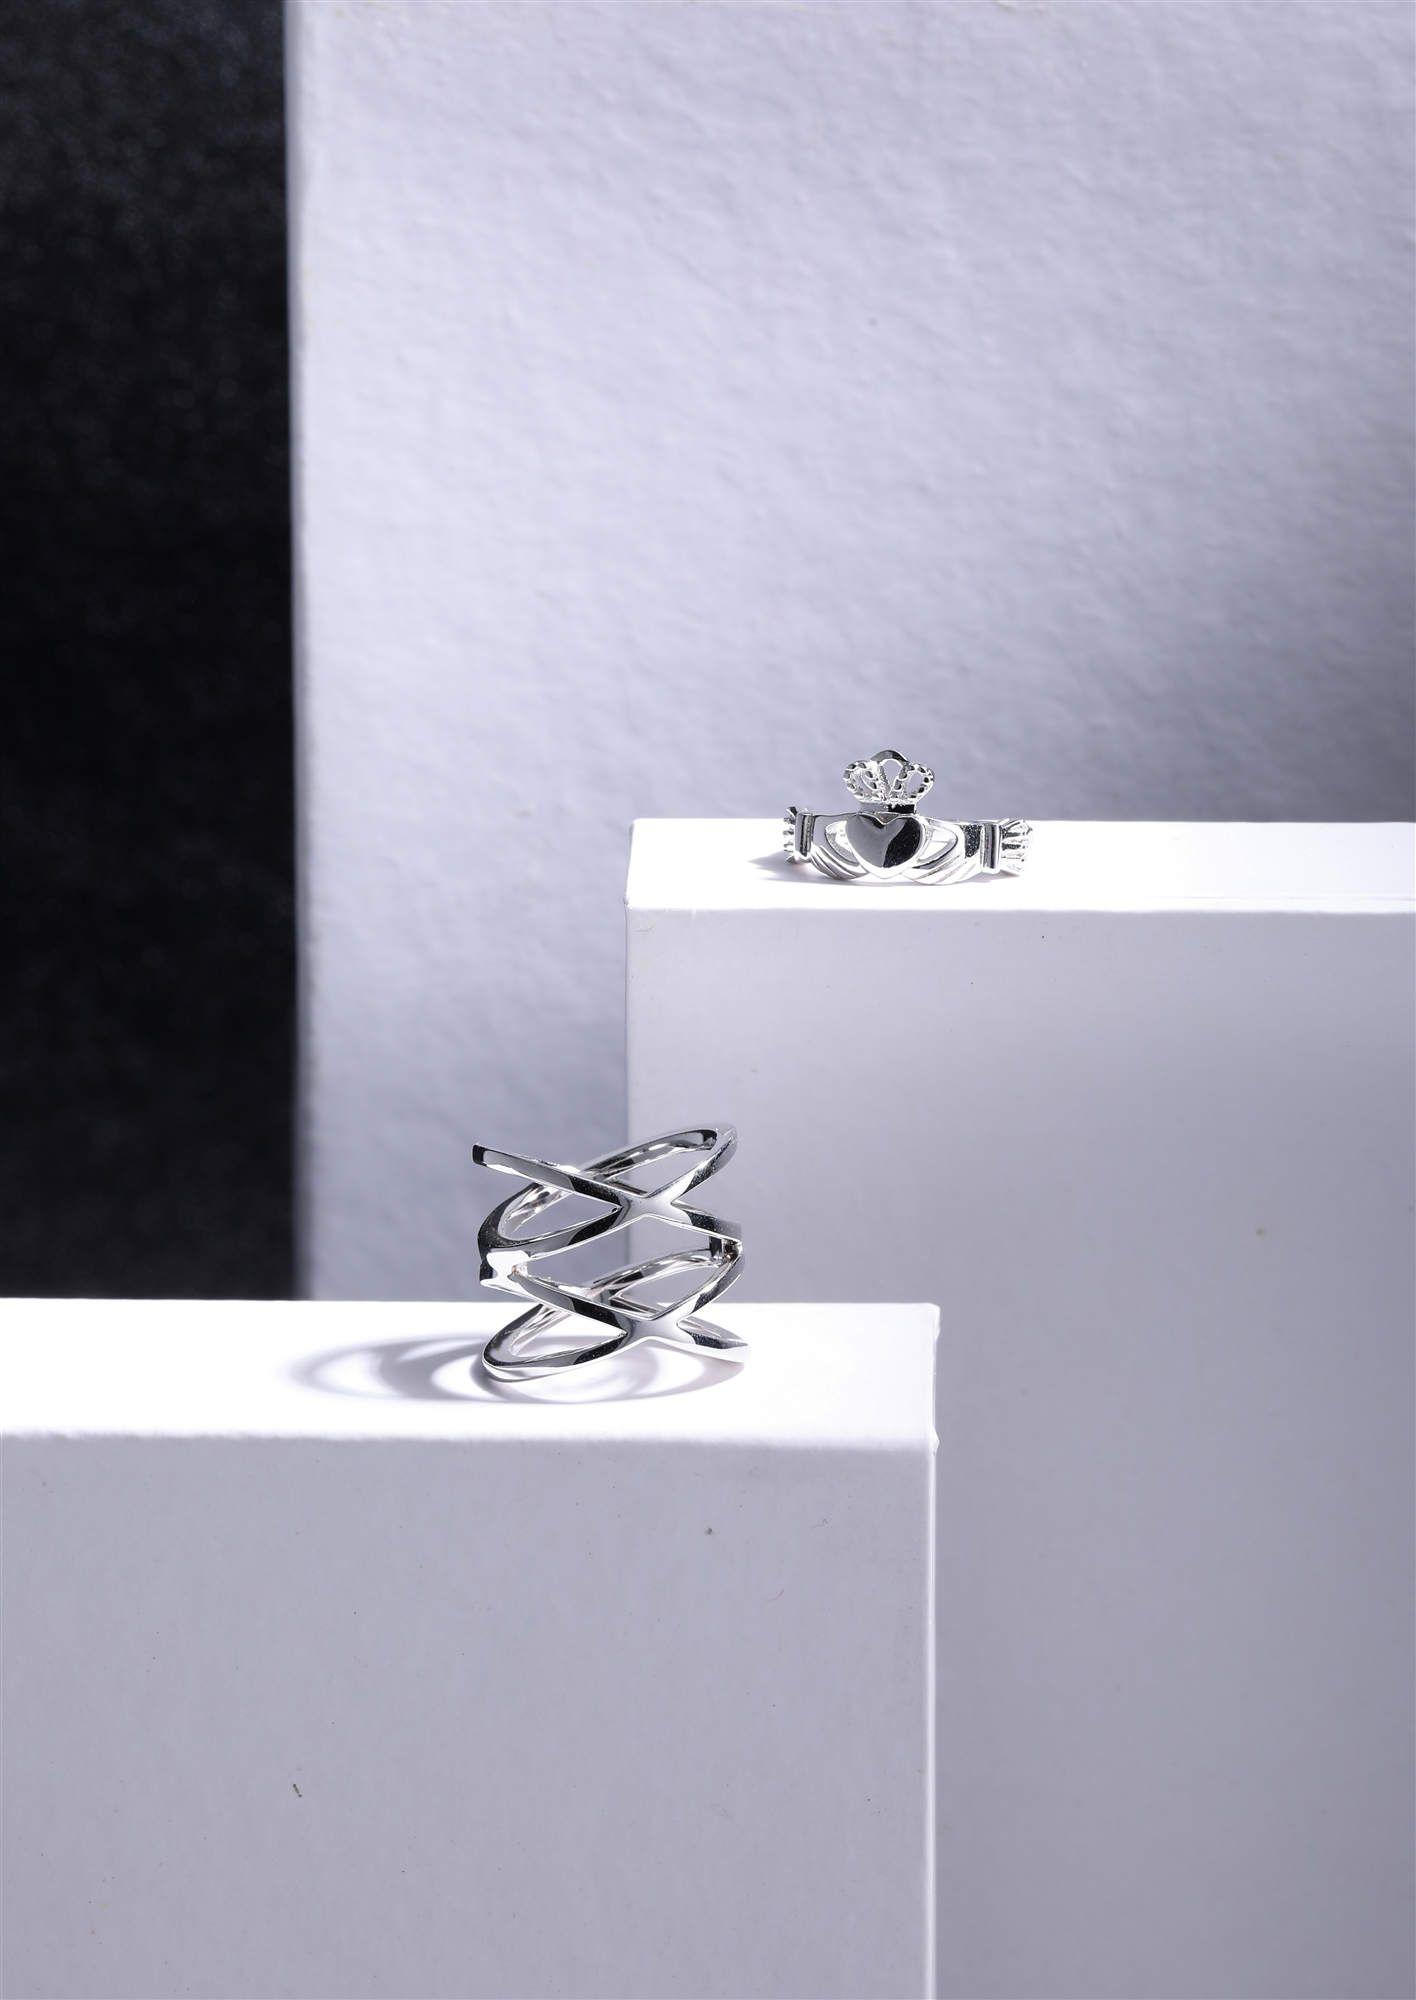 This Claddagh Engagement Ring symbolizes the eternal Irish